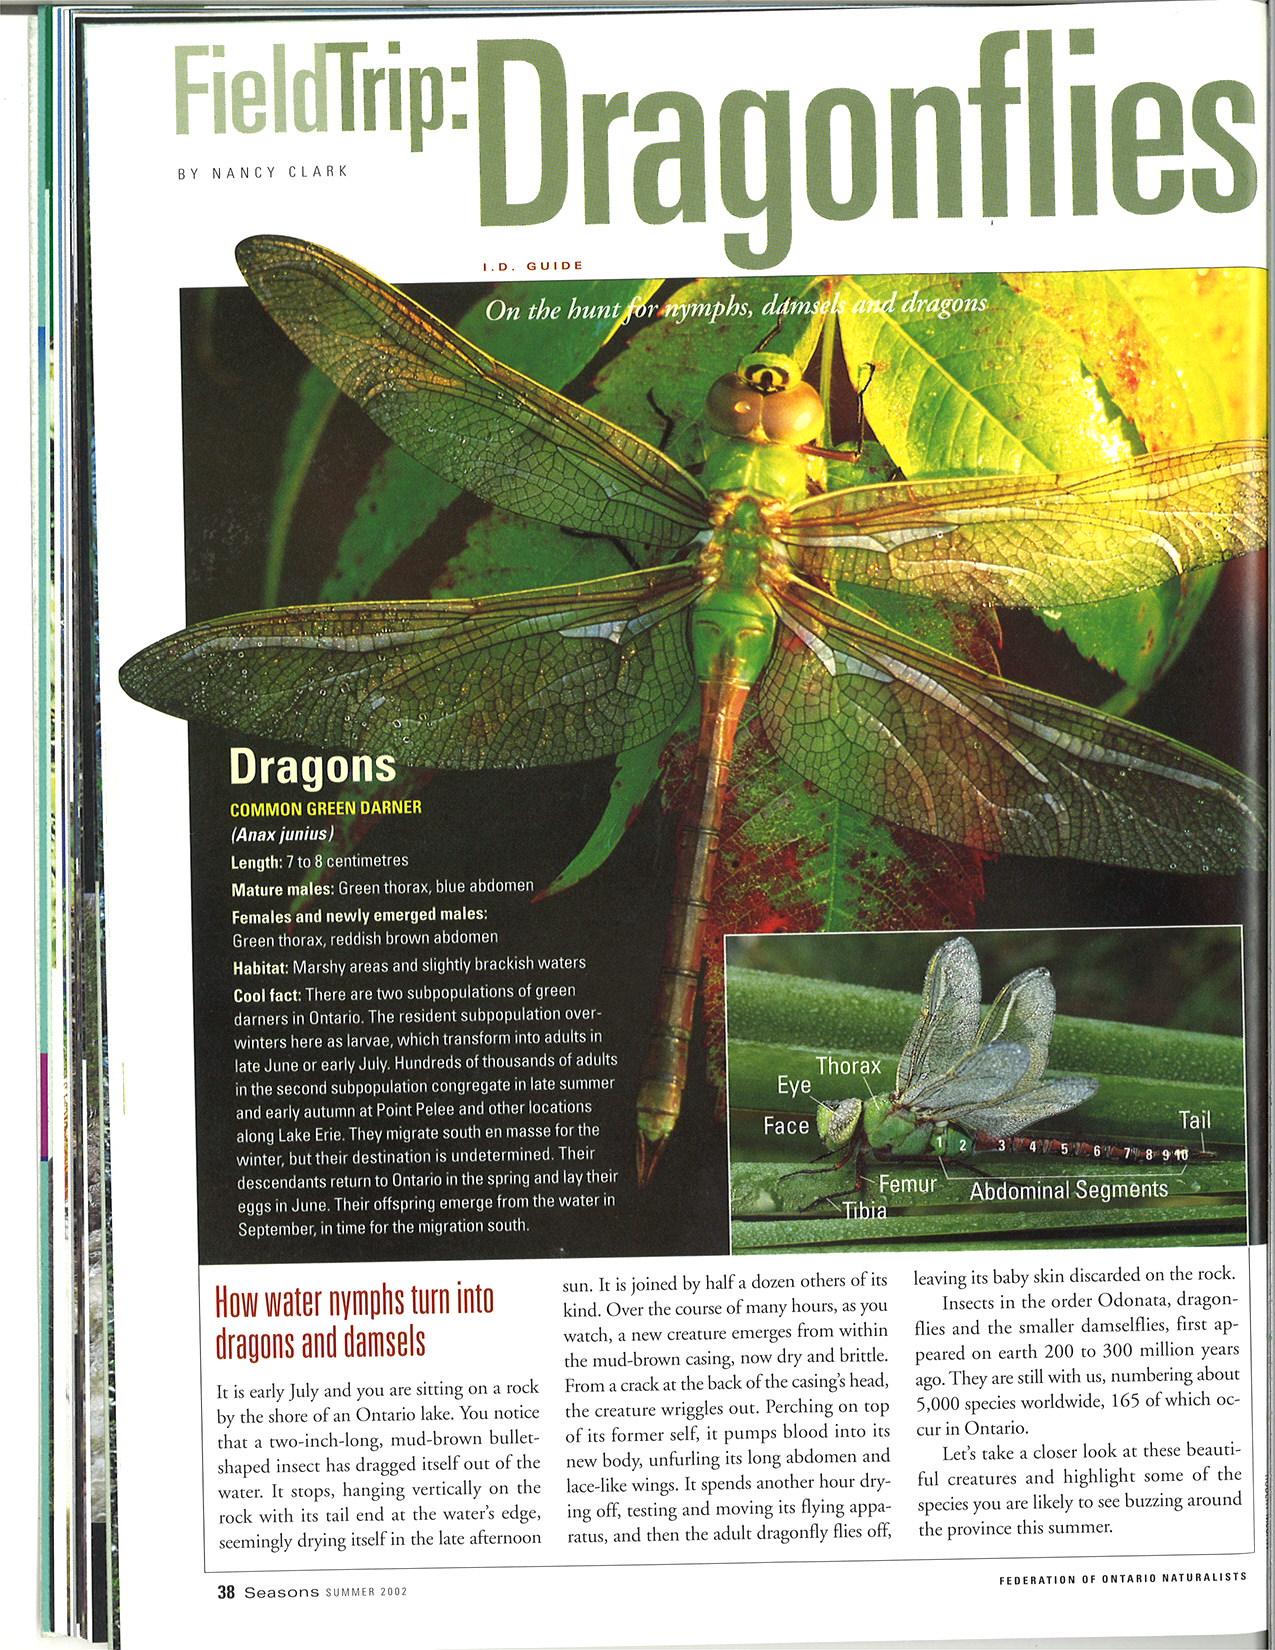 seasons_2002_v42_i1_d_feild_trip_dragonflies_38